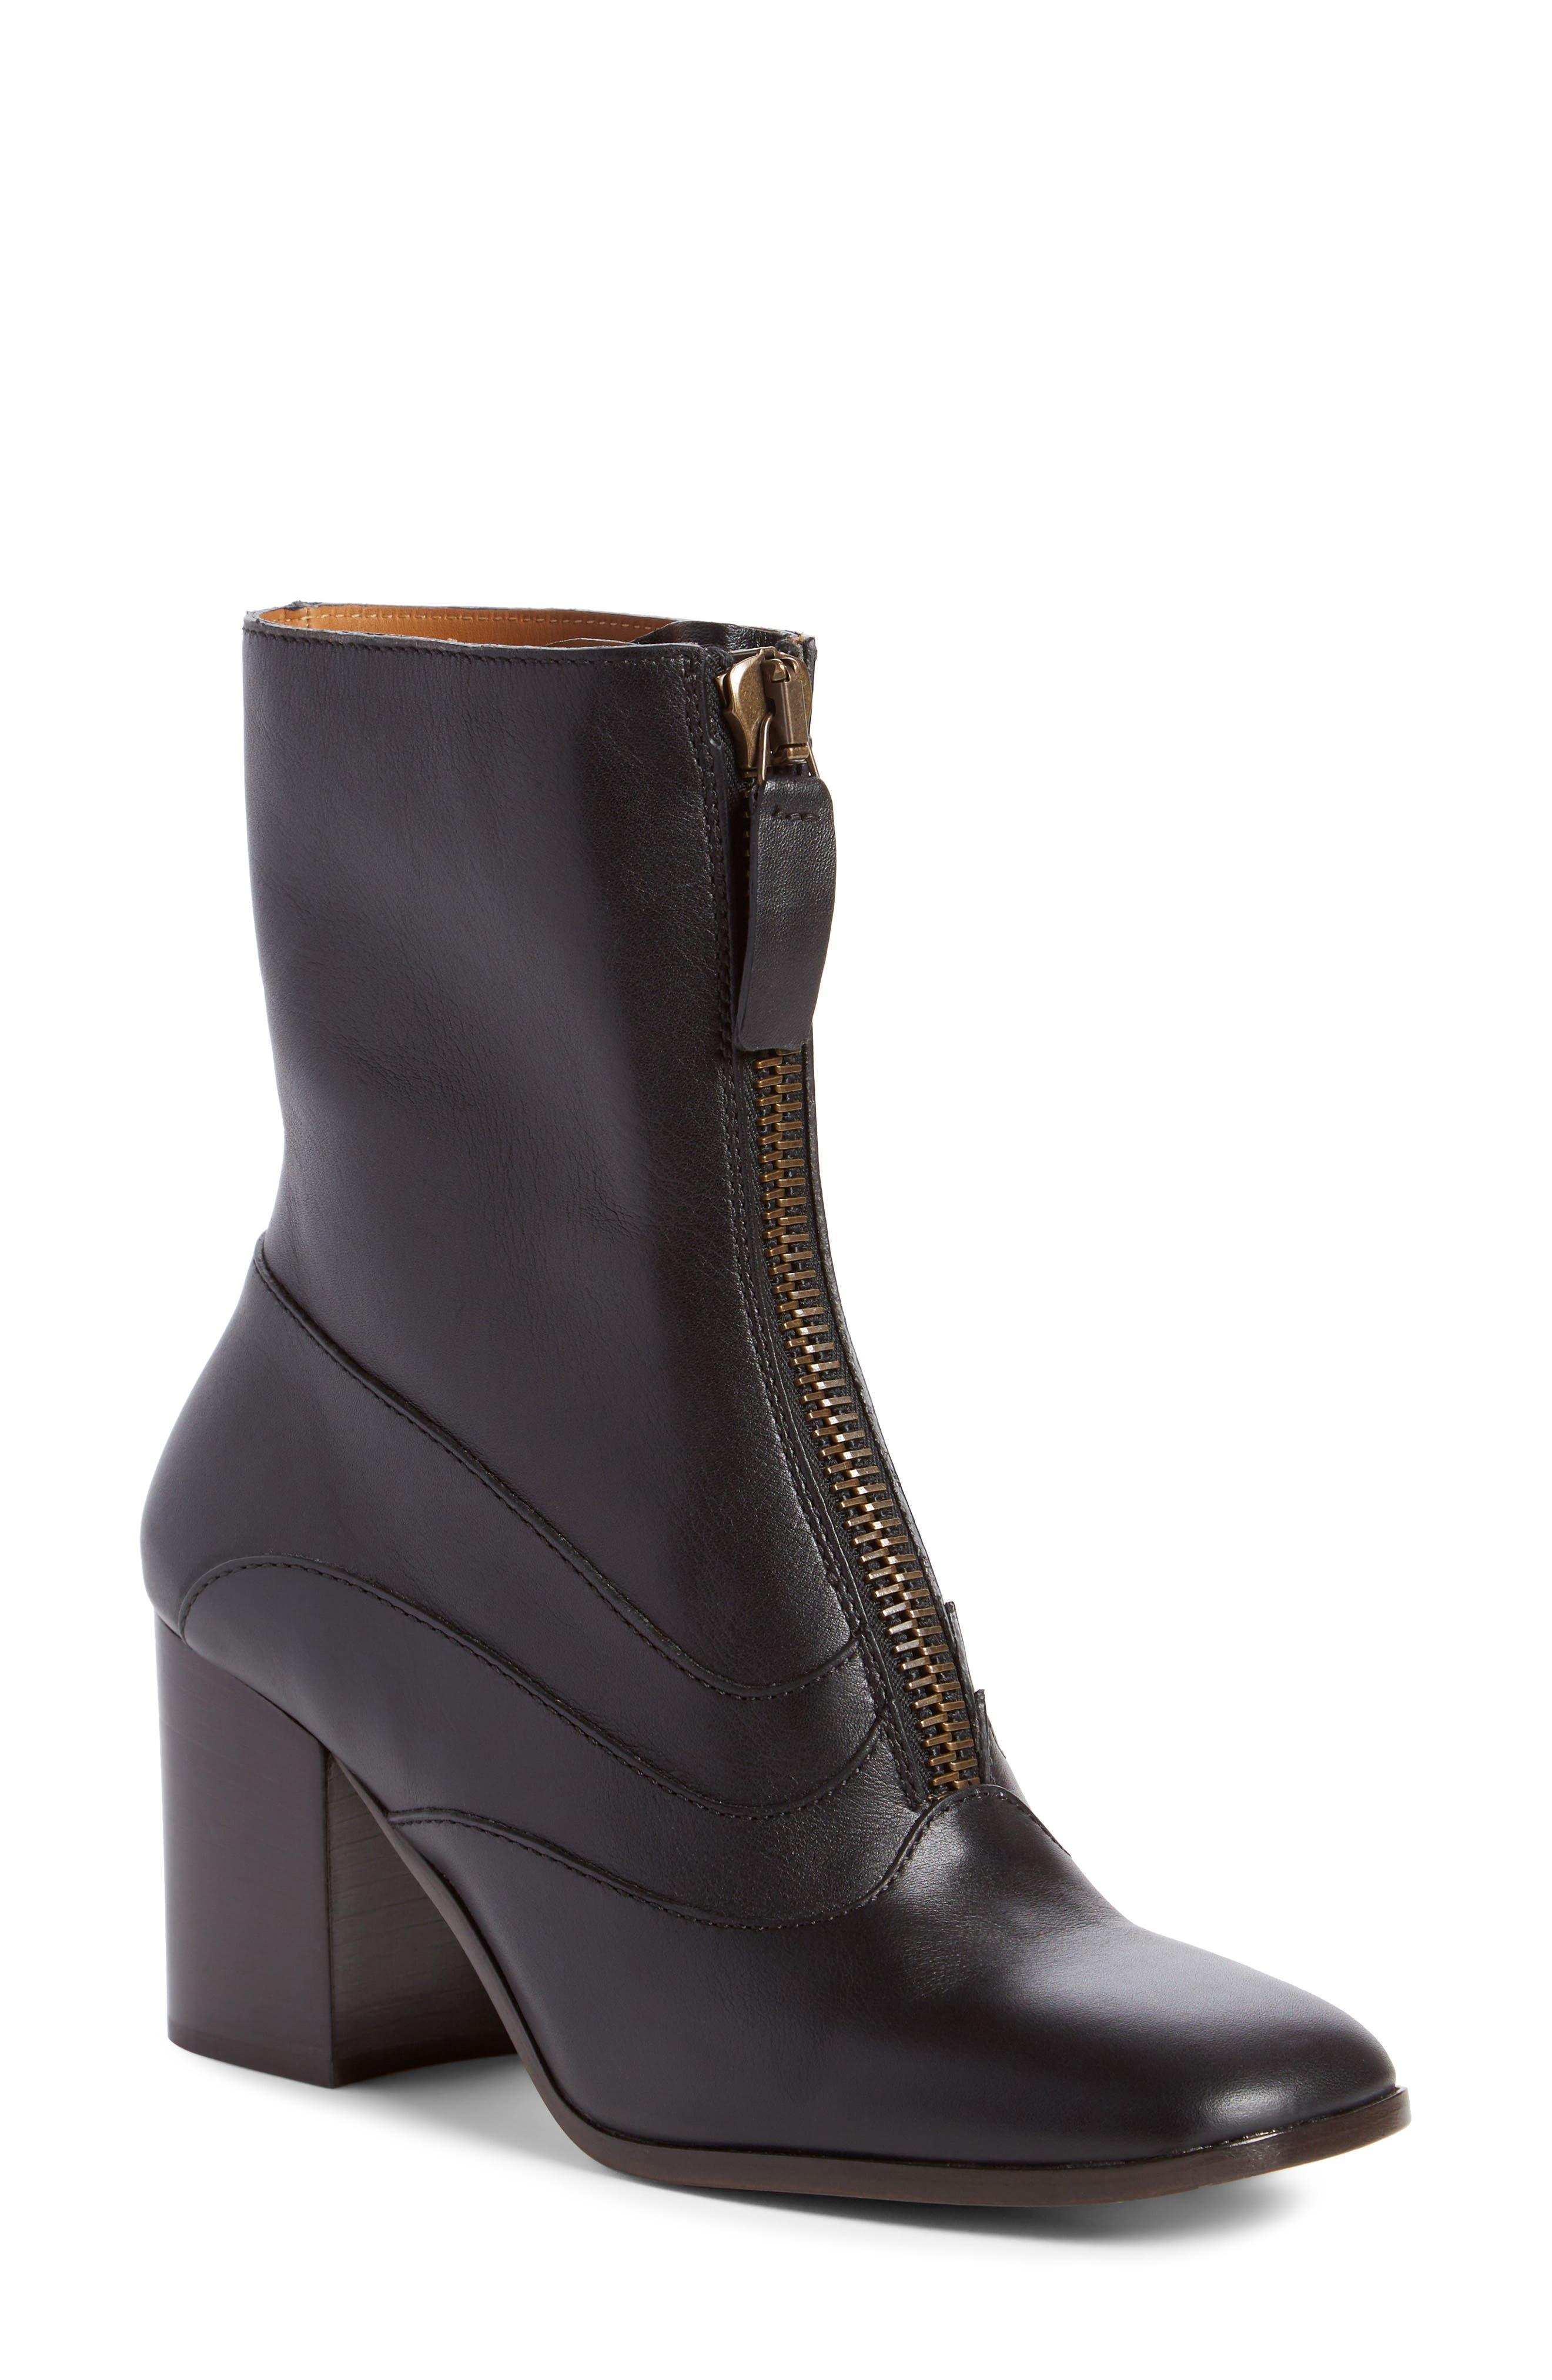 Qacey Square Toe Boot,                             Main thumbnail 1, color,                             Black